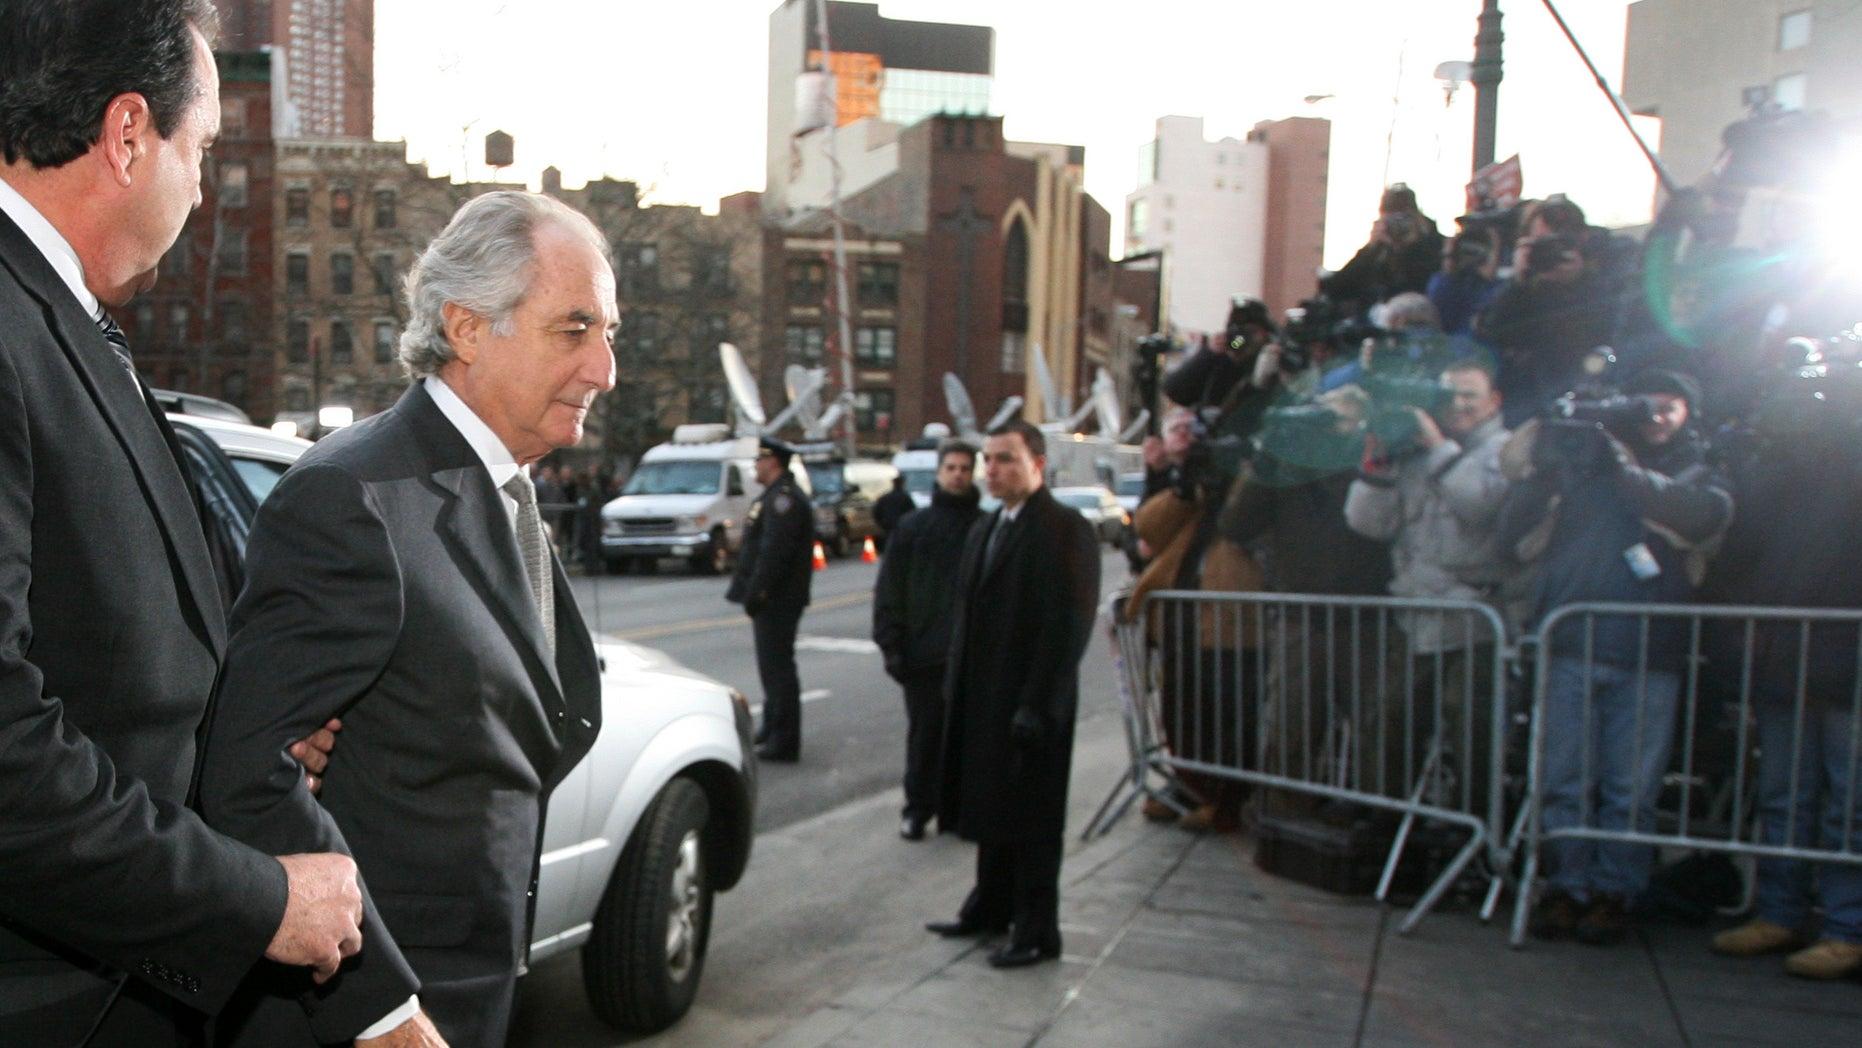 Bernard Madoff arrives at federal court in New York.